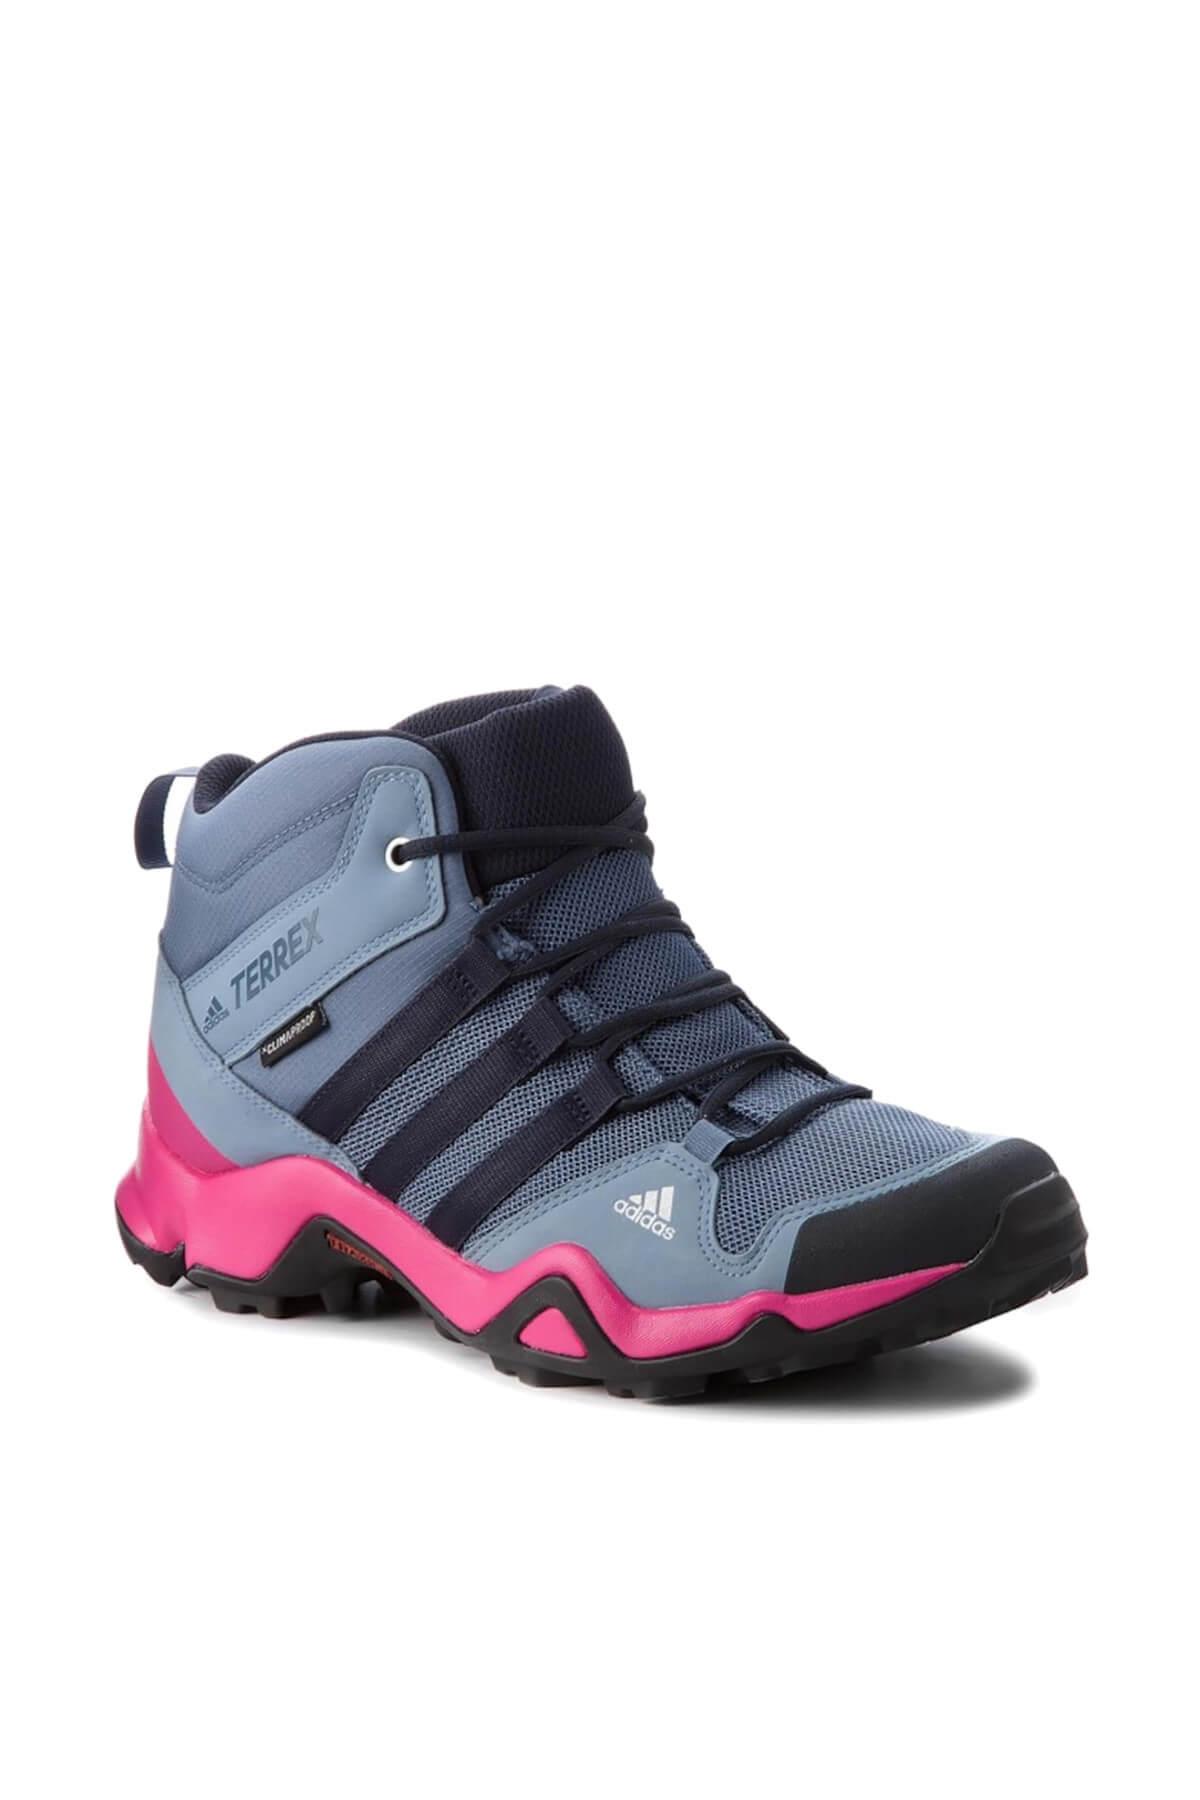 adidas TERREX AX2R MID CP İndigo Unisex Çocuk Fitness Ayakkabısı 100449111 1